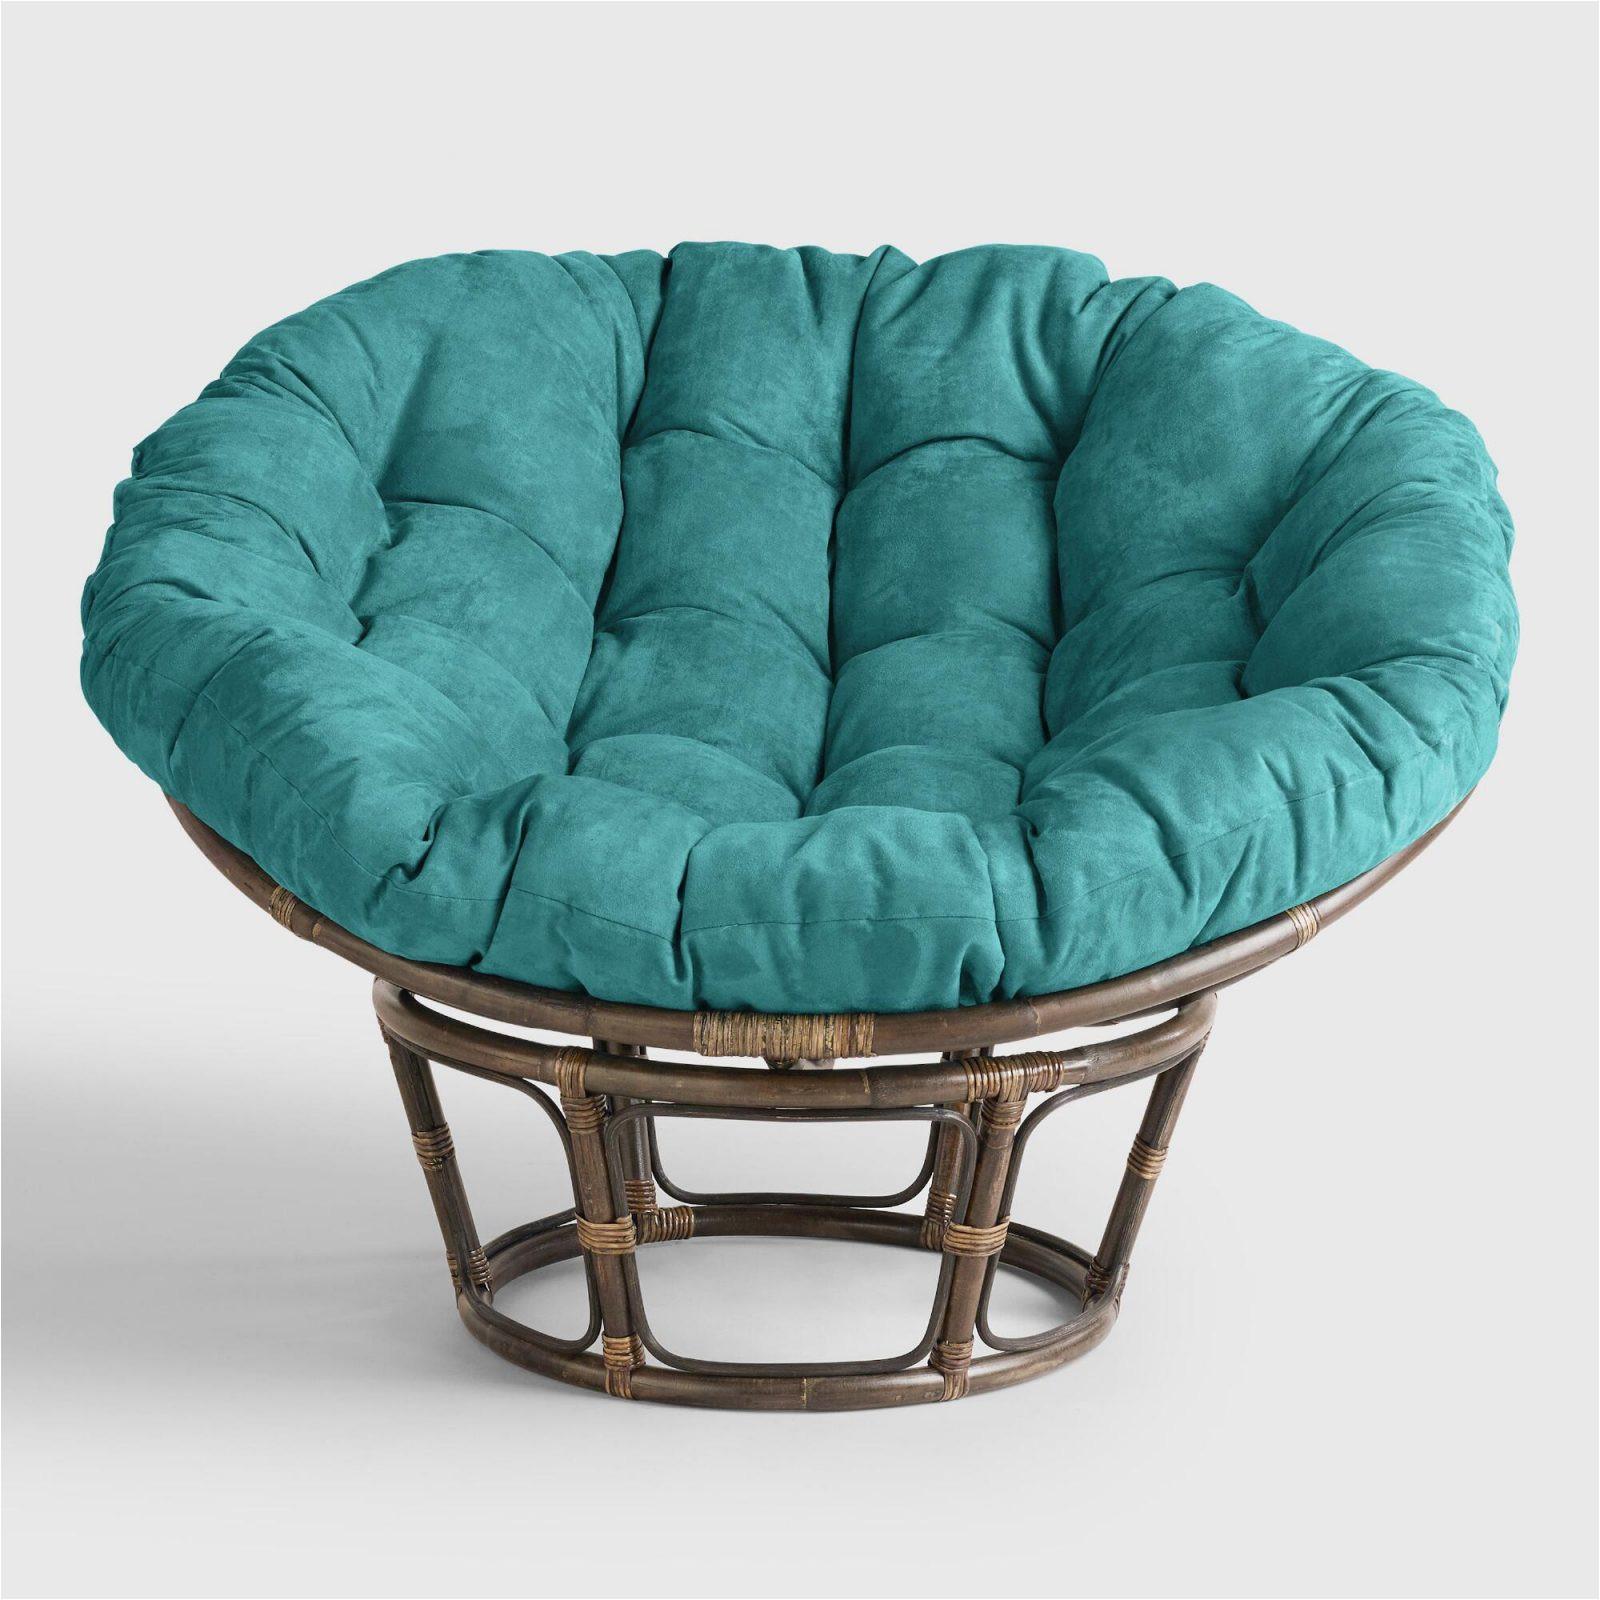 porcelain micro suede papasan chair cushion world market amazon 20800 x ikea pier one cover 1600